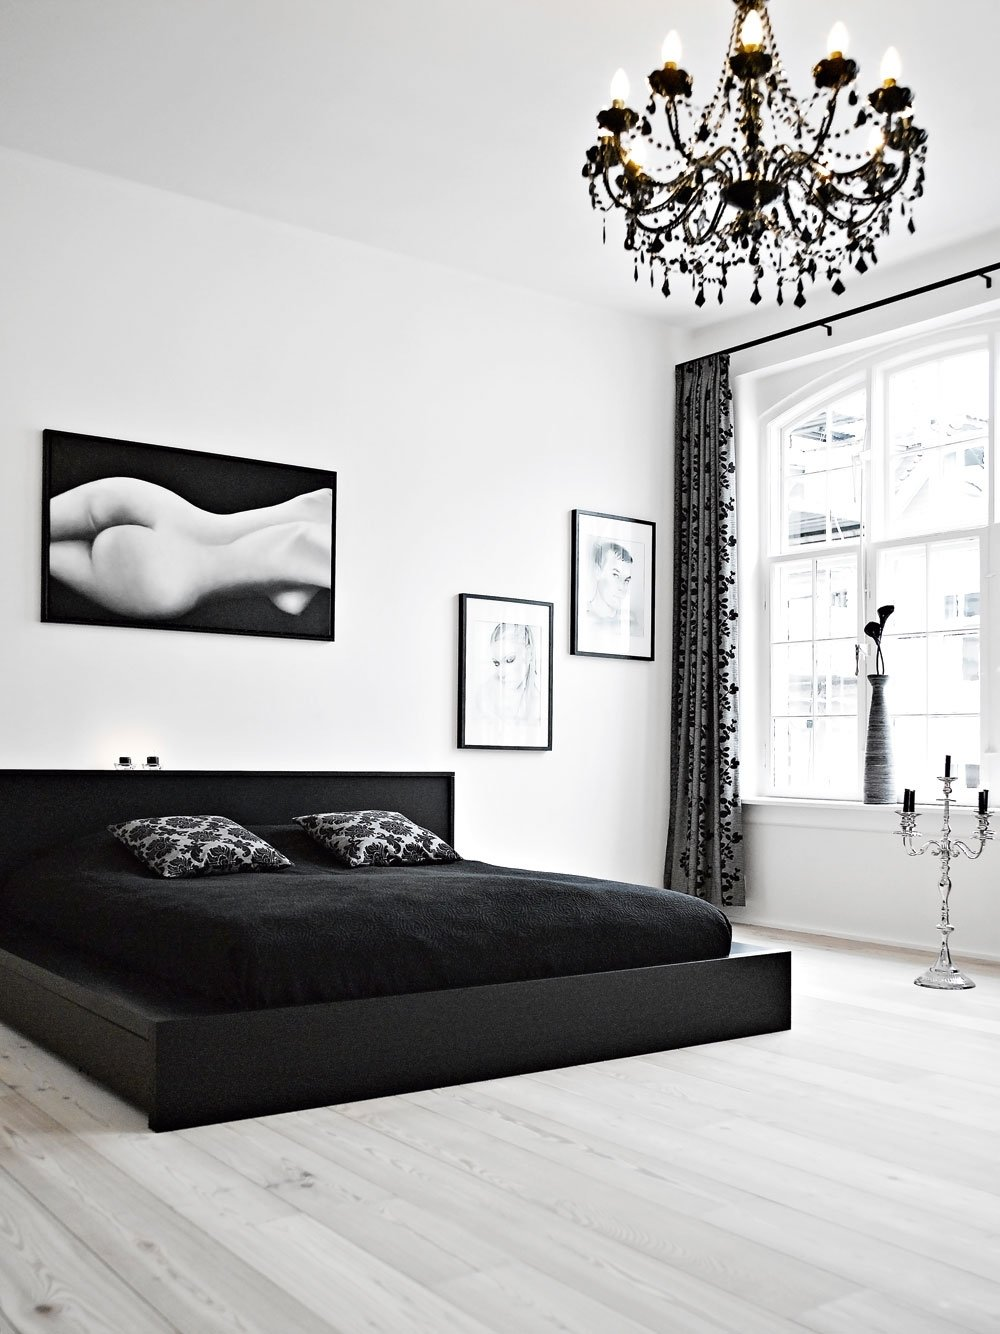 10 Wonderful Black And White Bedroom Ideas monochrome black and white bedroom furniture womenmisbehavin 2020